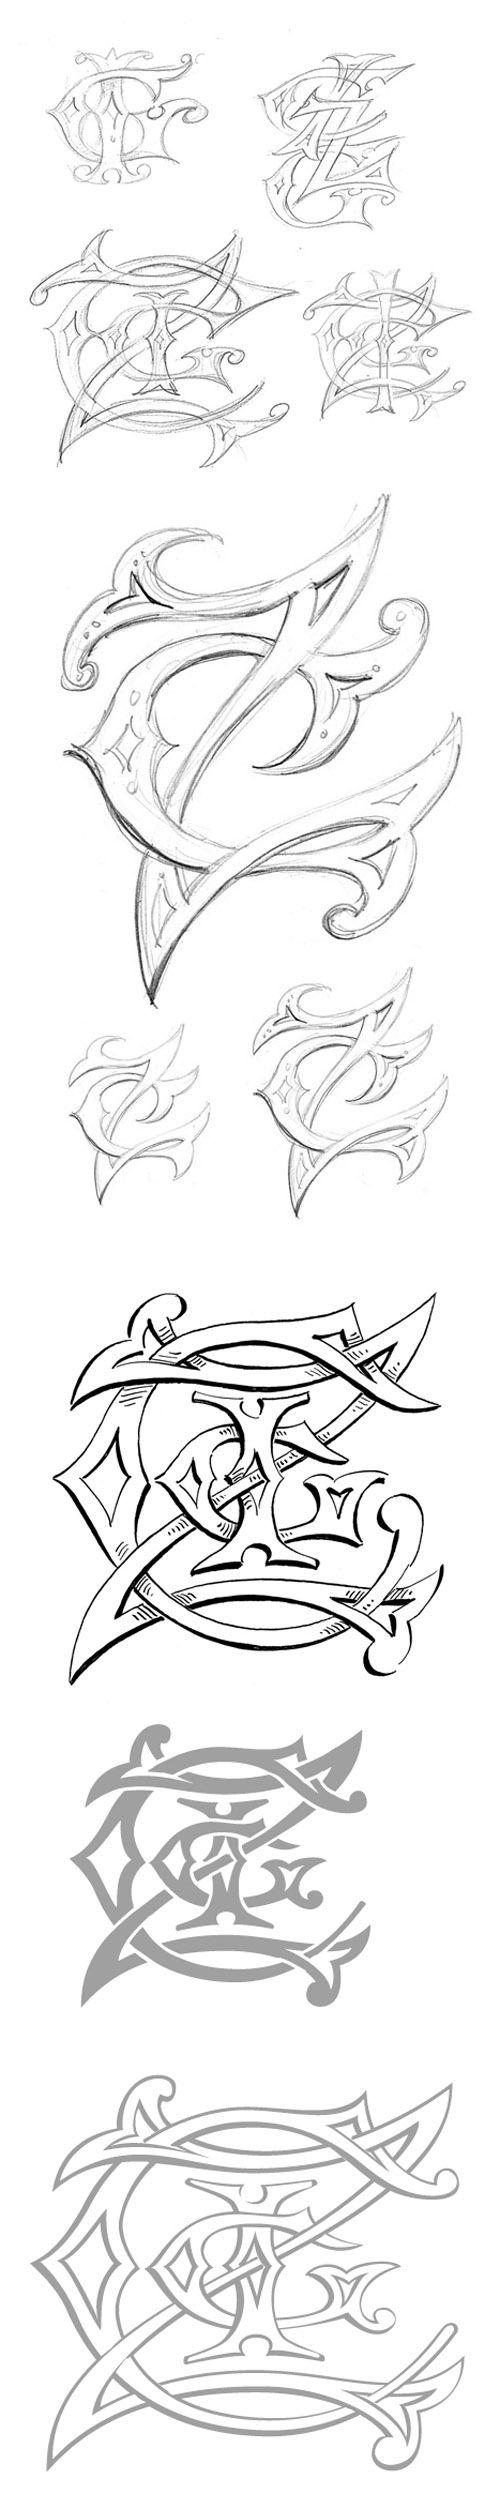 Wedding Design Ideas from Michelle Rago - The Four Letter Monogram